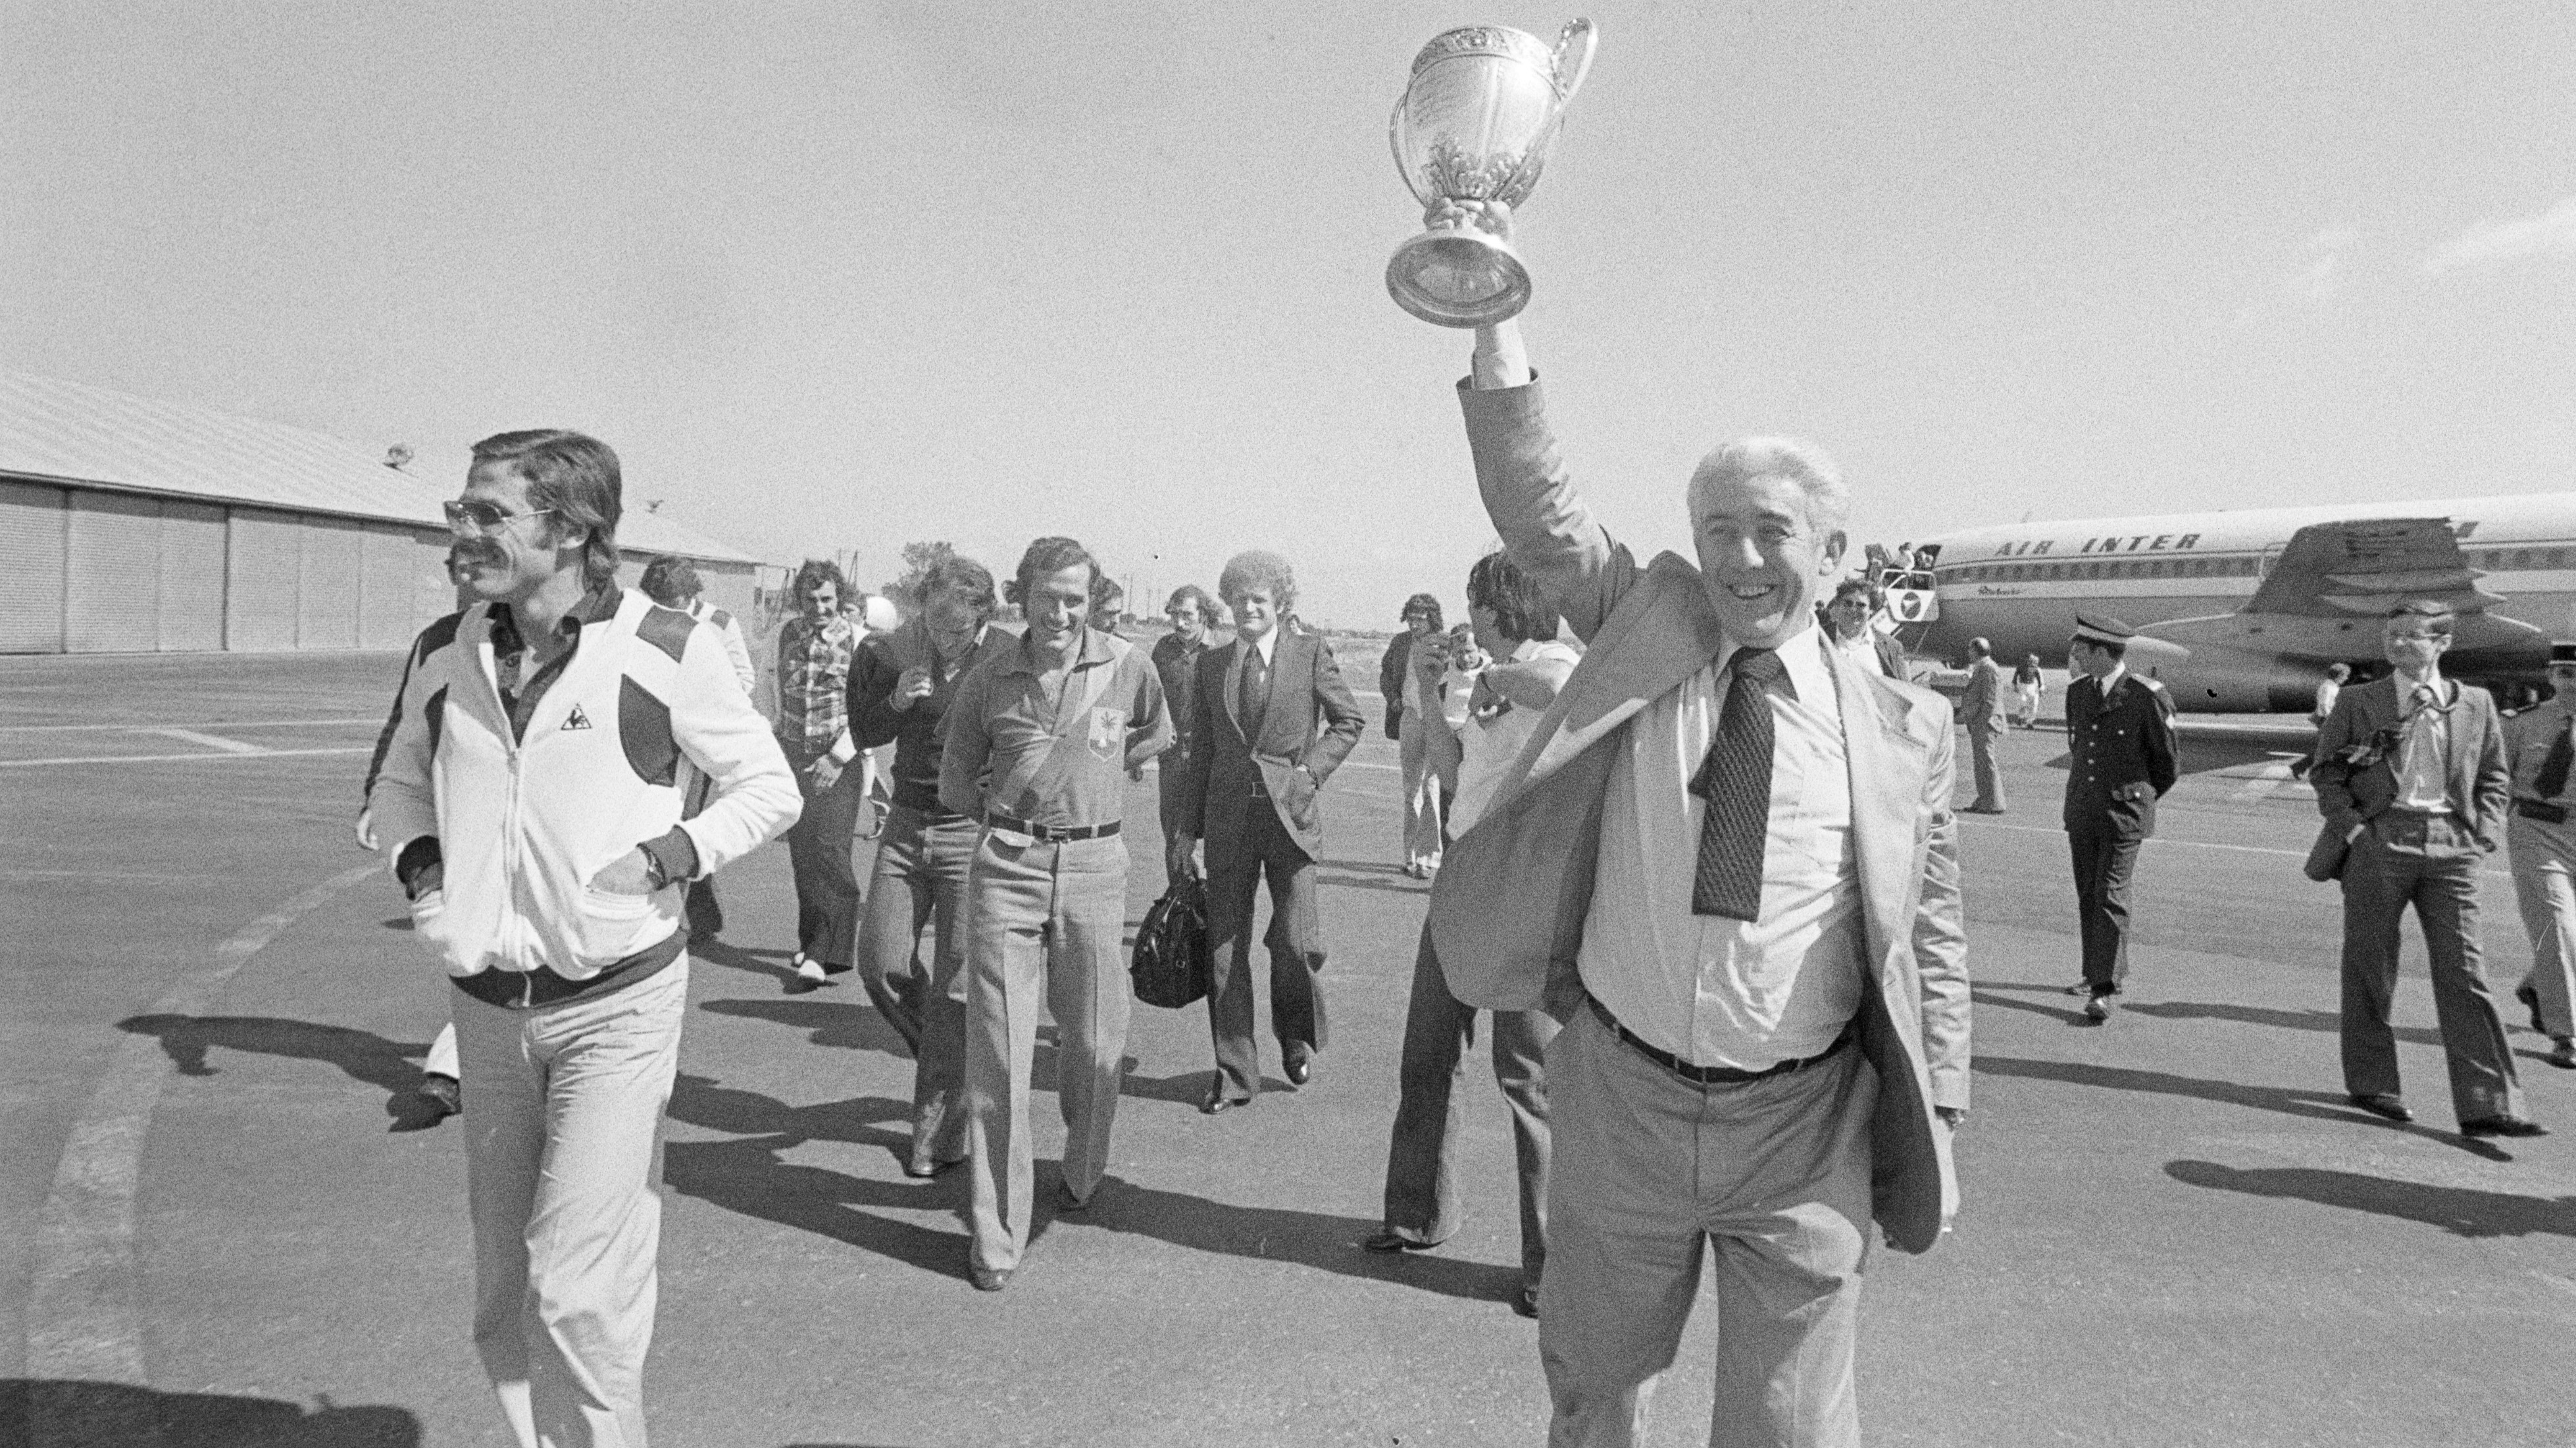 Roger Rocher Saint-Etienne 1977